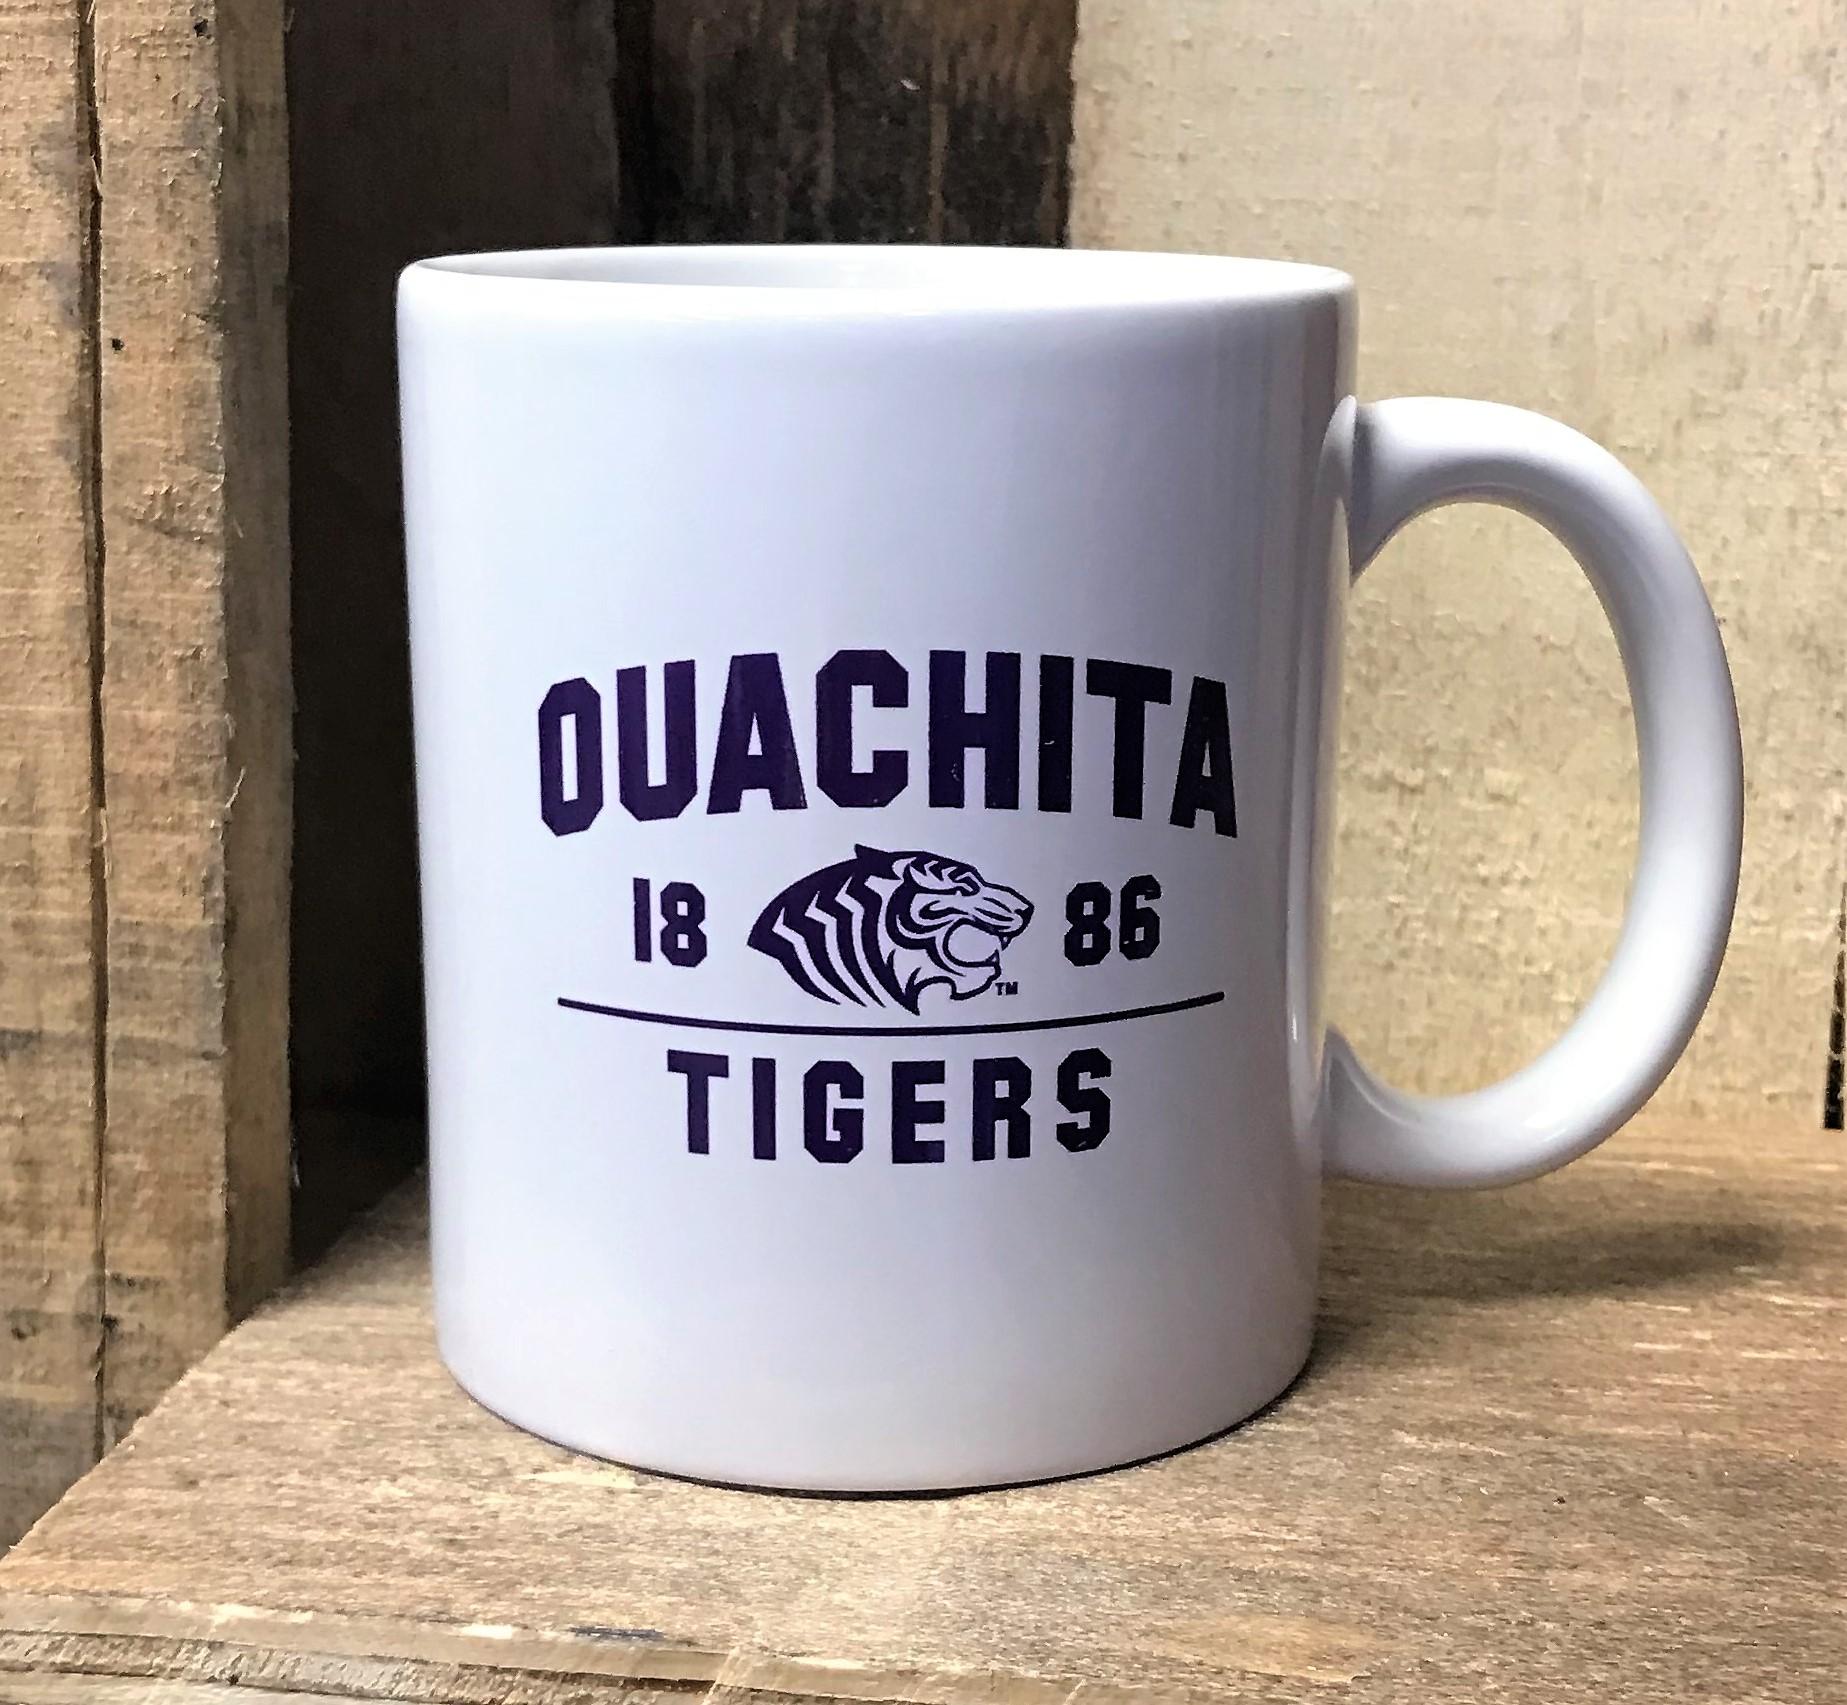 OUACHITA TIGERS MUG